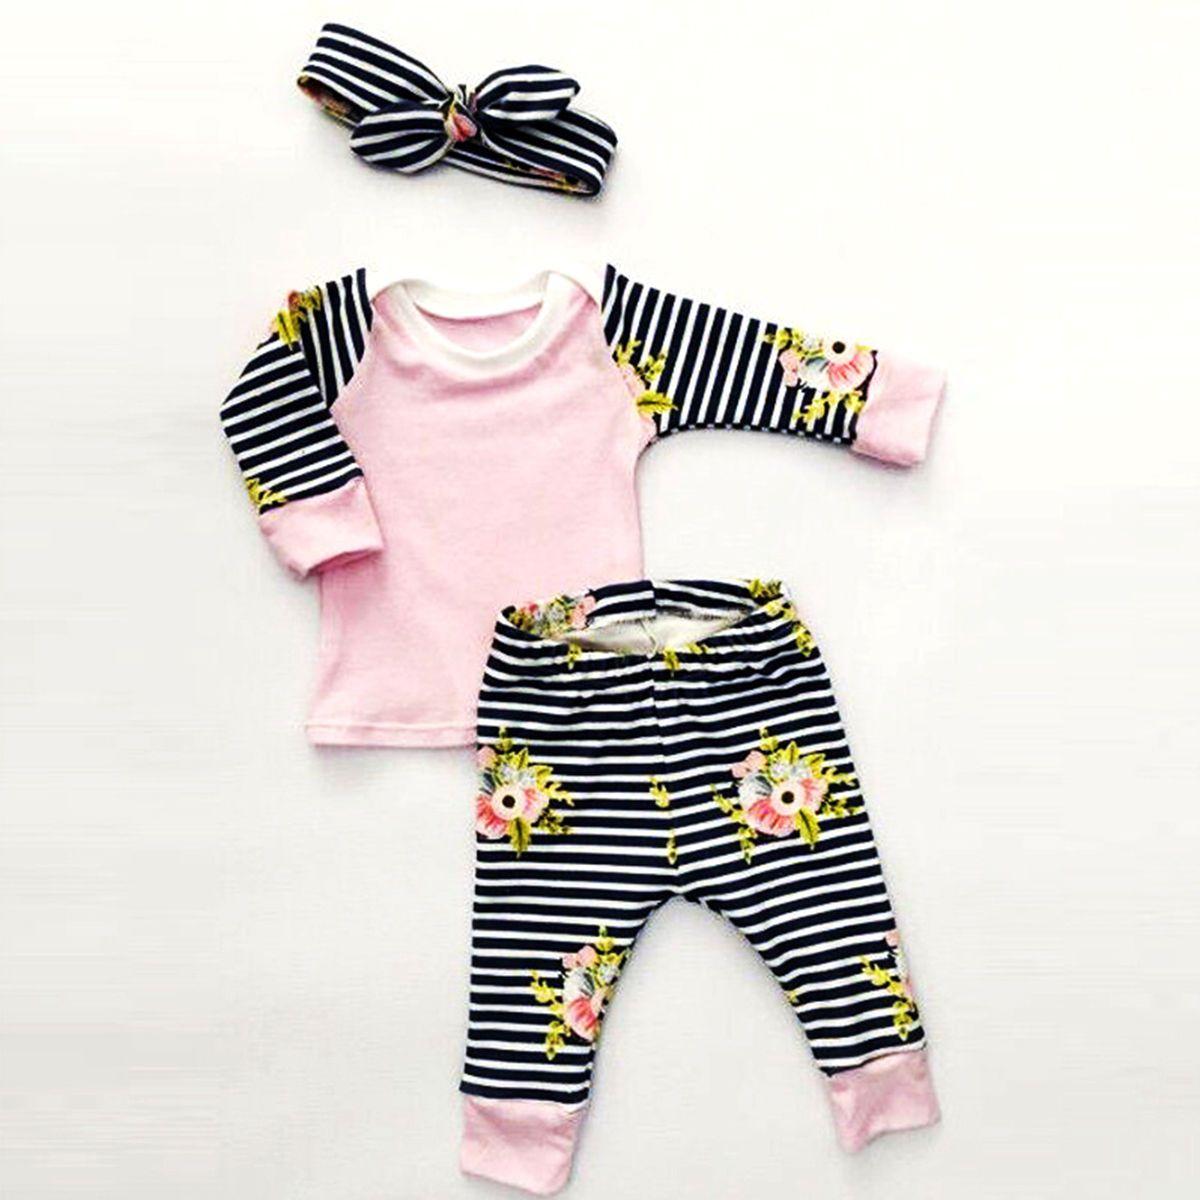 b4c182707 Toddler Baby Kids Girls Clothes T-shirt Pants Leggings Headband 3PCS ...